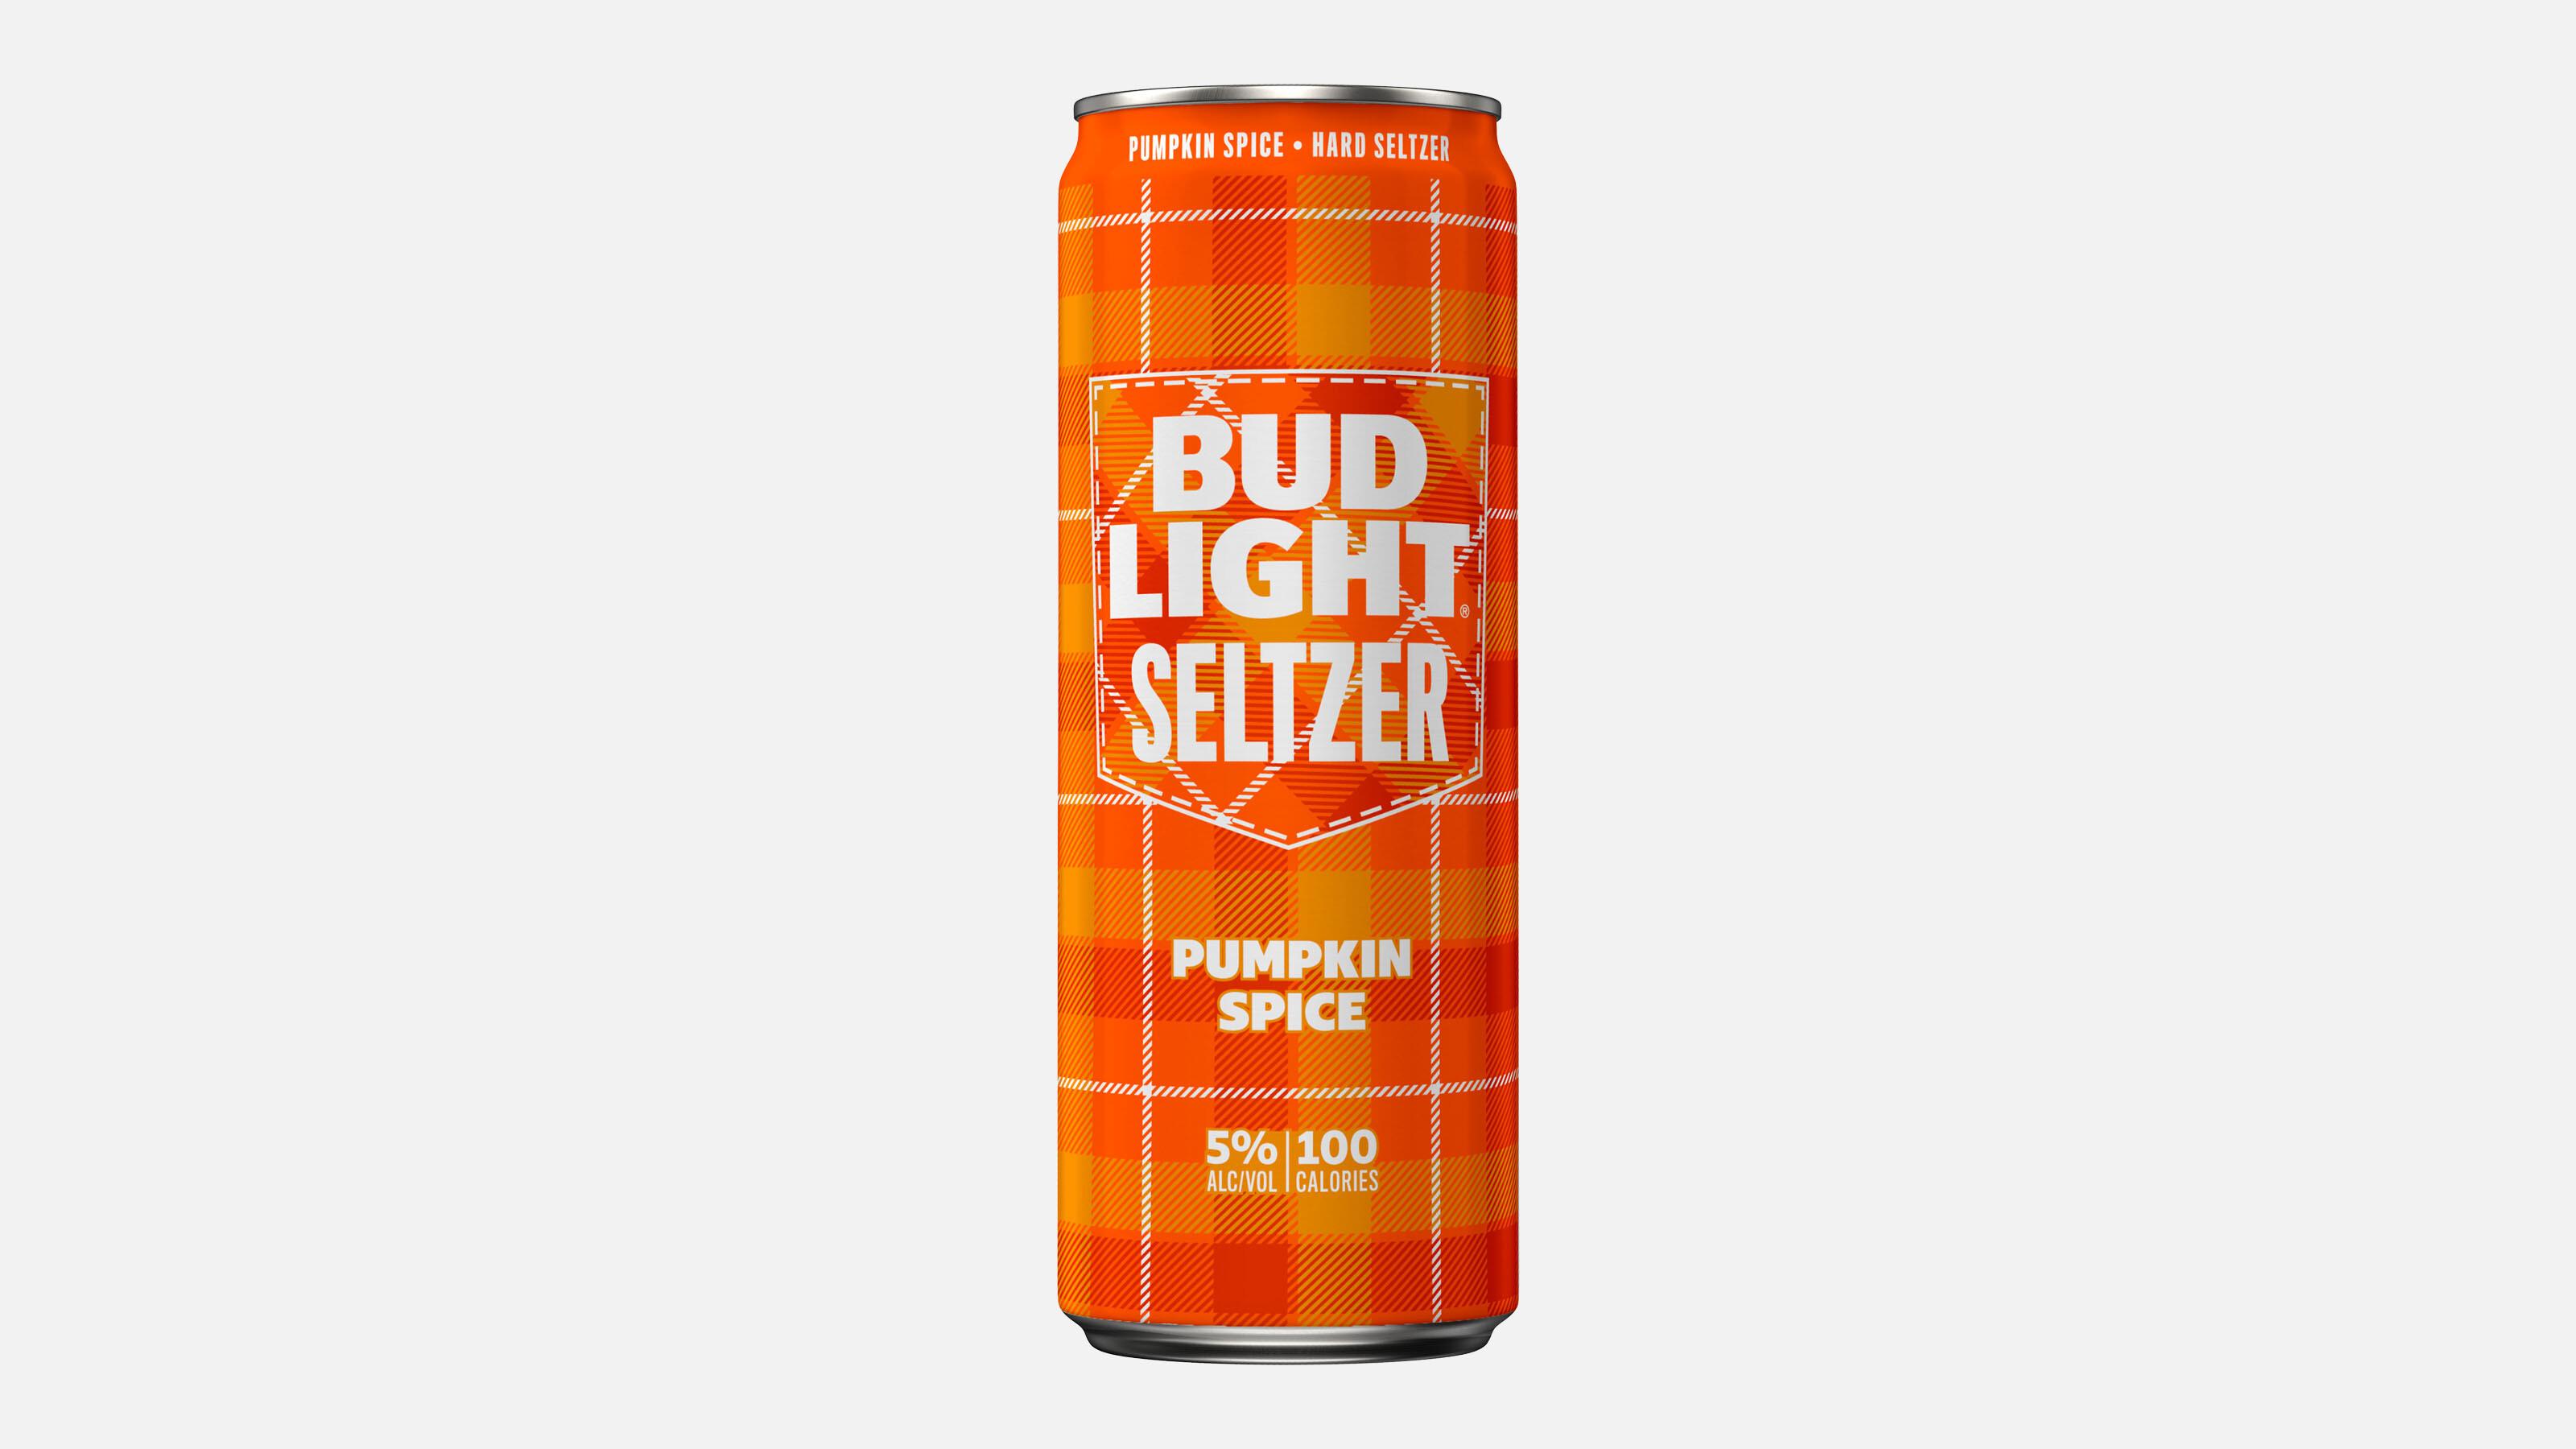 Bud Light is launching a pumpkin spice spiked seltzer